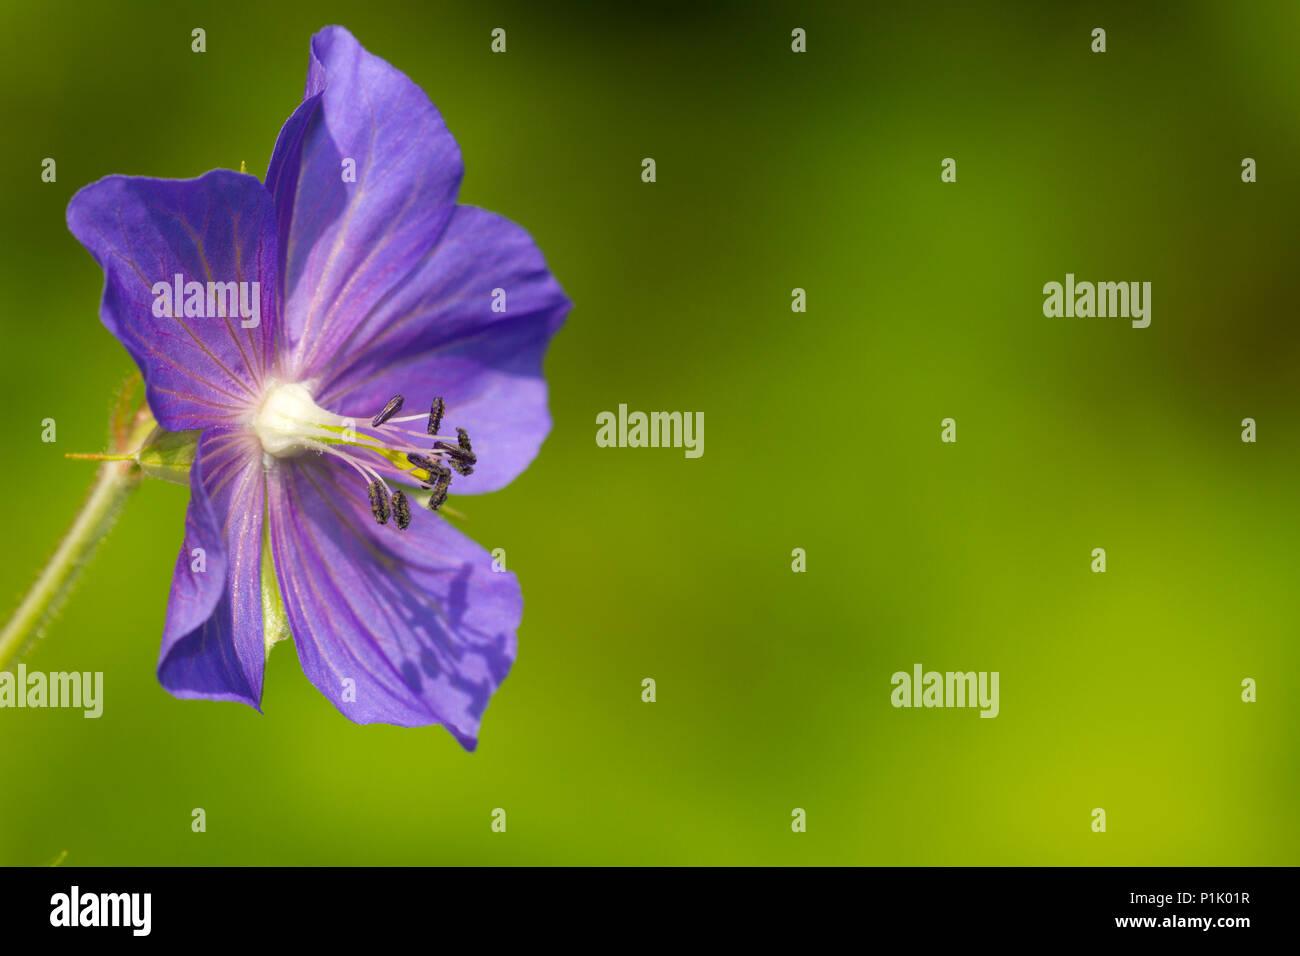 Meadow Cranesbill, Geranium pratense, ok, stork beak-like (gerani dimensional), family cranesbill family (geraniaceae),, Wiesen-Storchschnabel, Ordnun Stock Photo